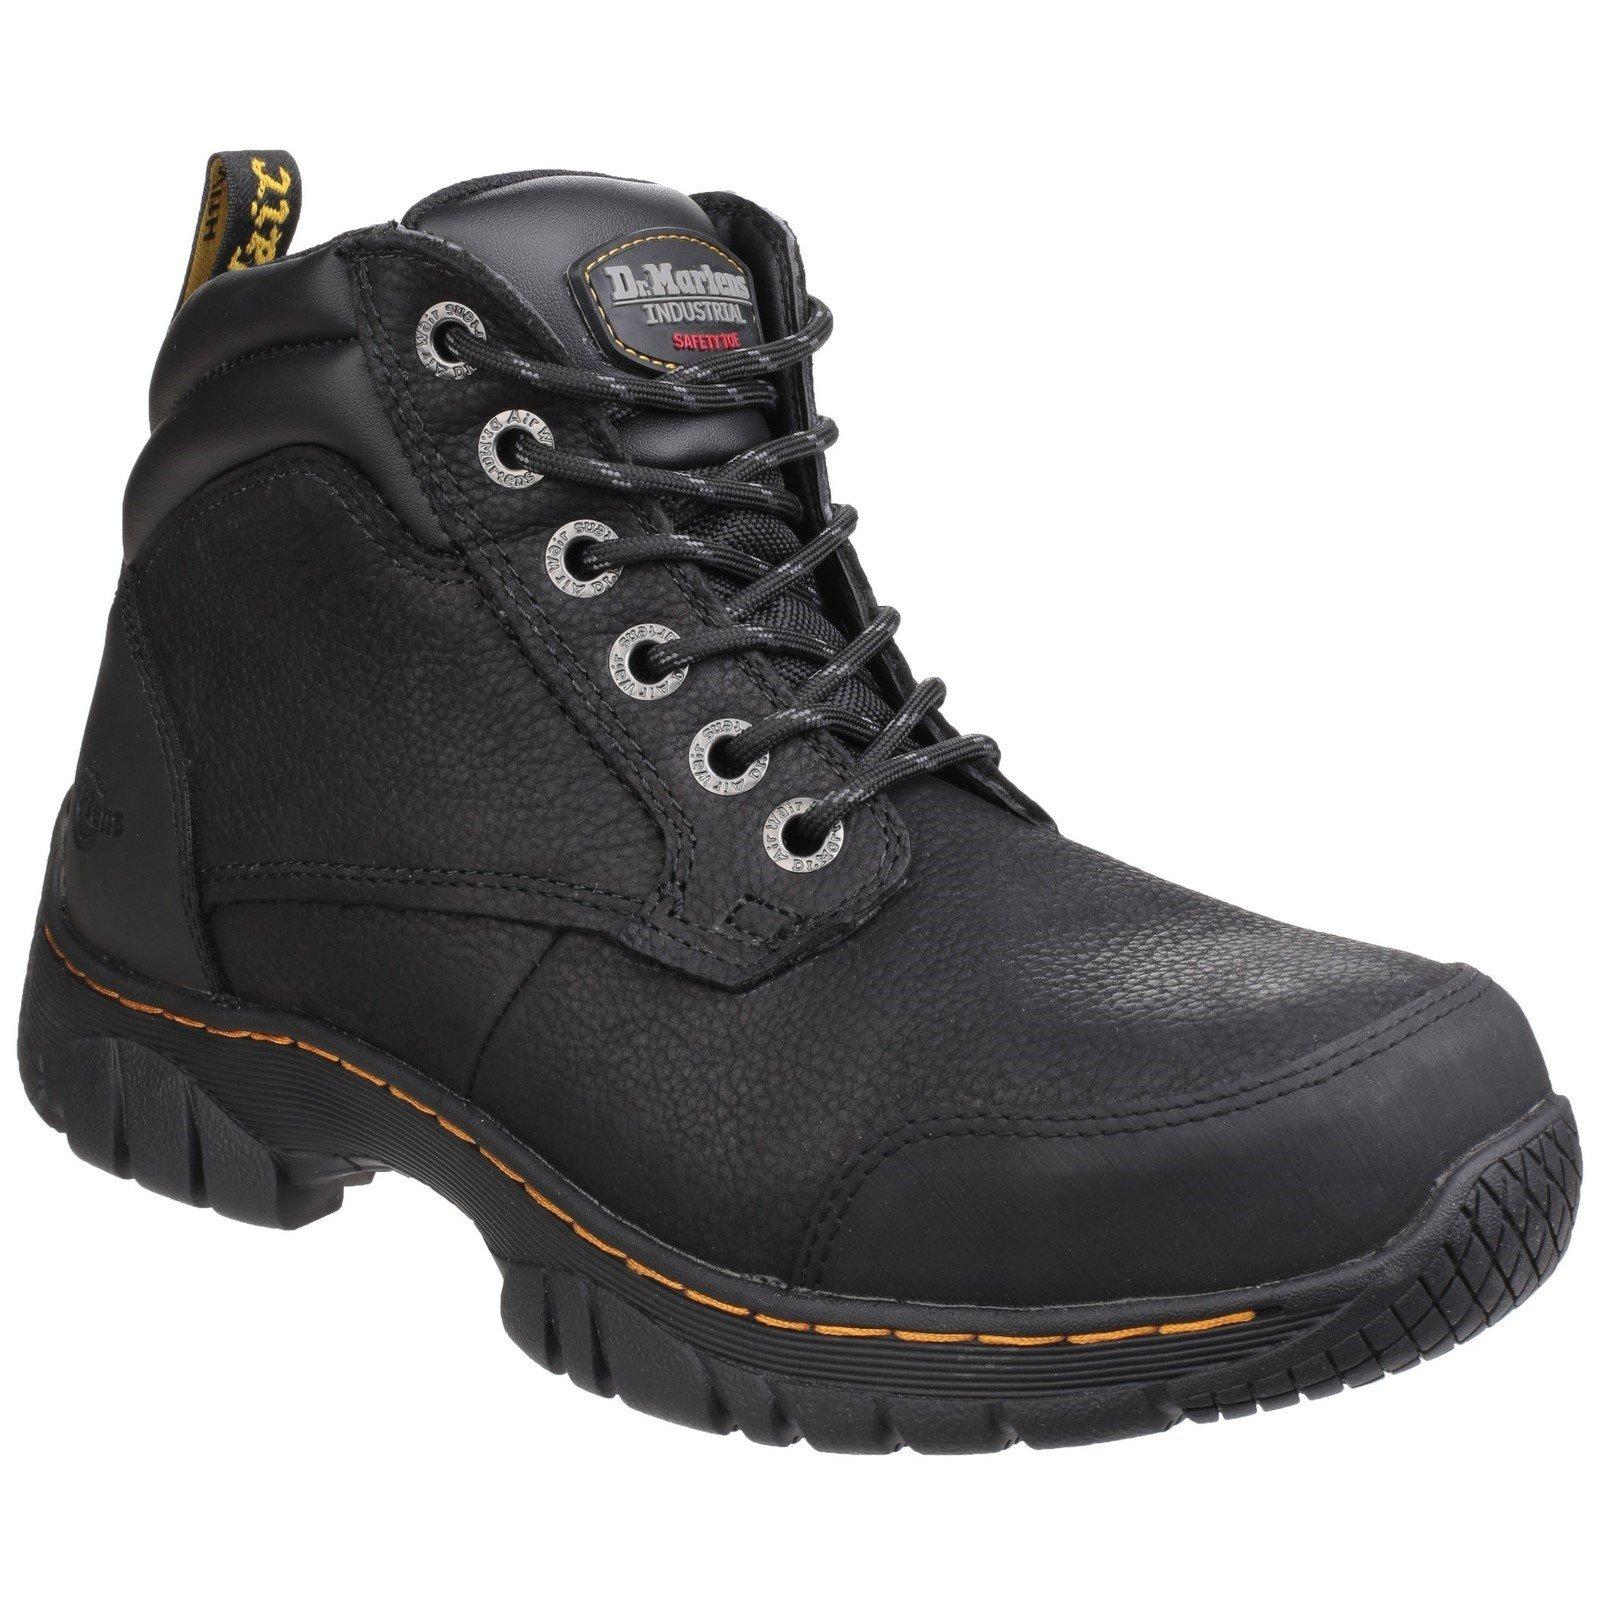 Dr Martens Unisex Riverton SB Lace up Hiker Boot Black 24533 - Black 12